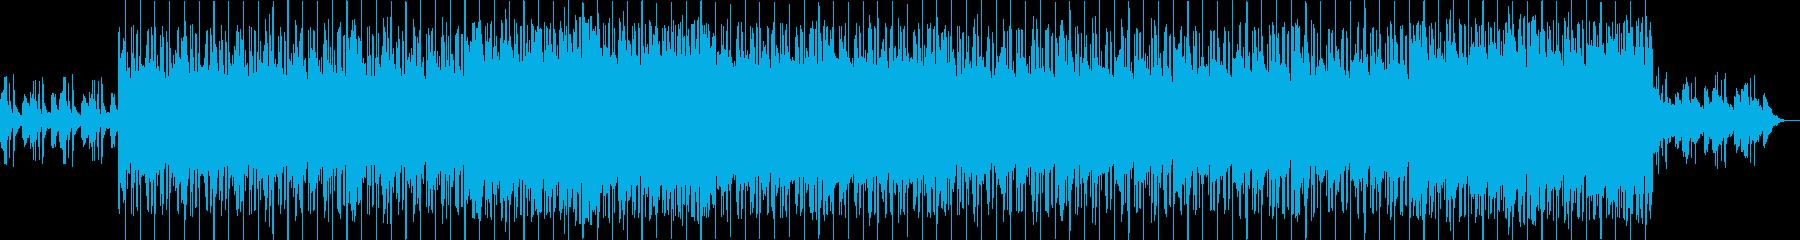 bpm116-メロウなギターVoのEDMの再生済みの波形